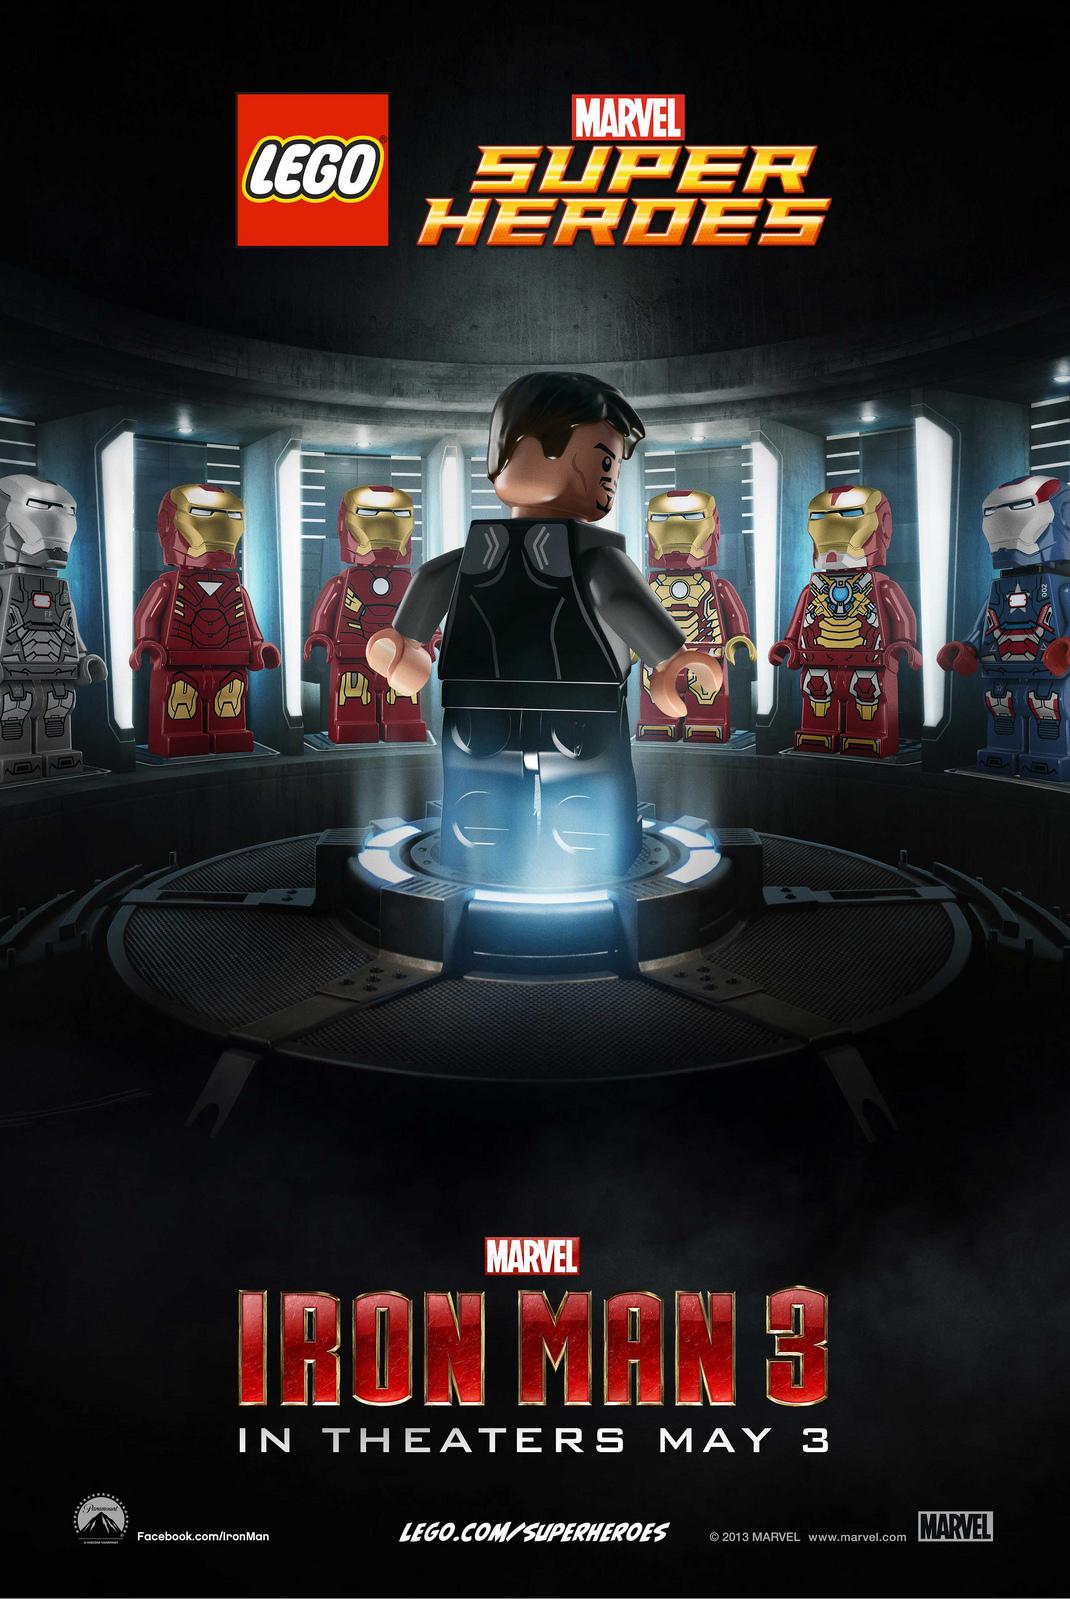 Iron-Man-3-Lego-Poster-2.jpg